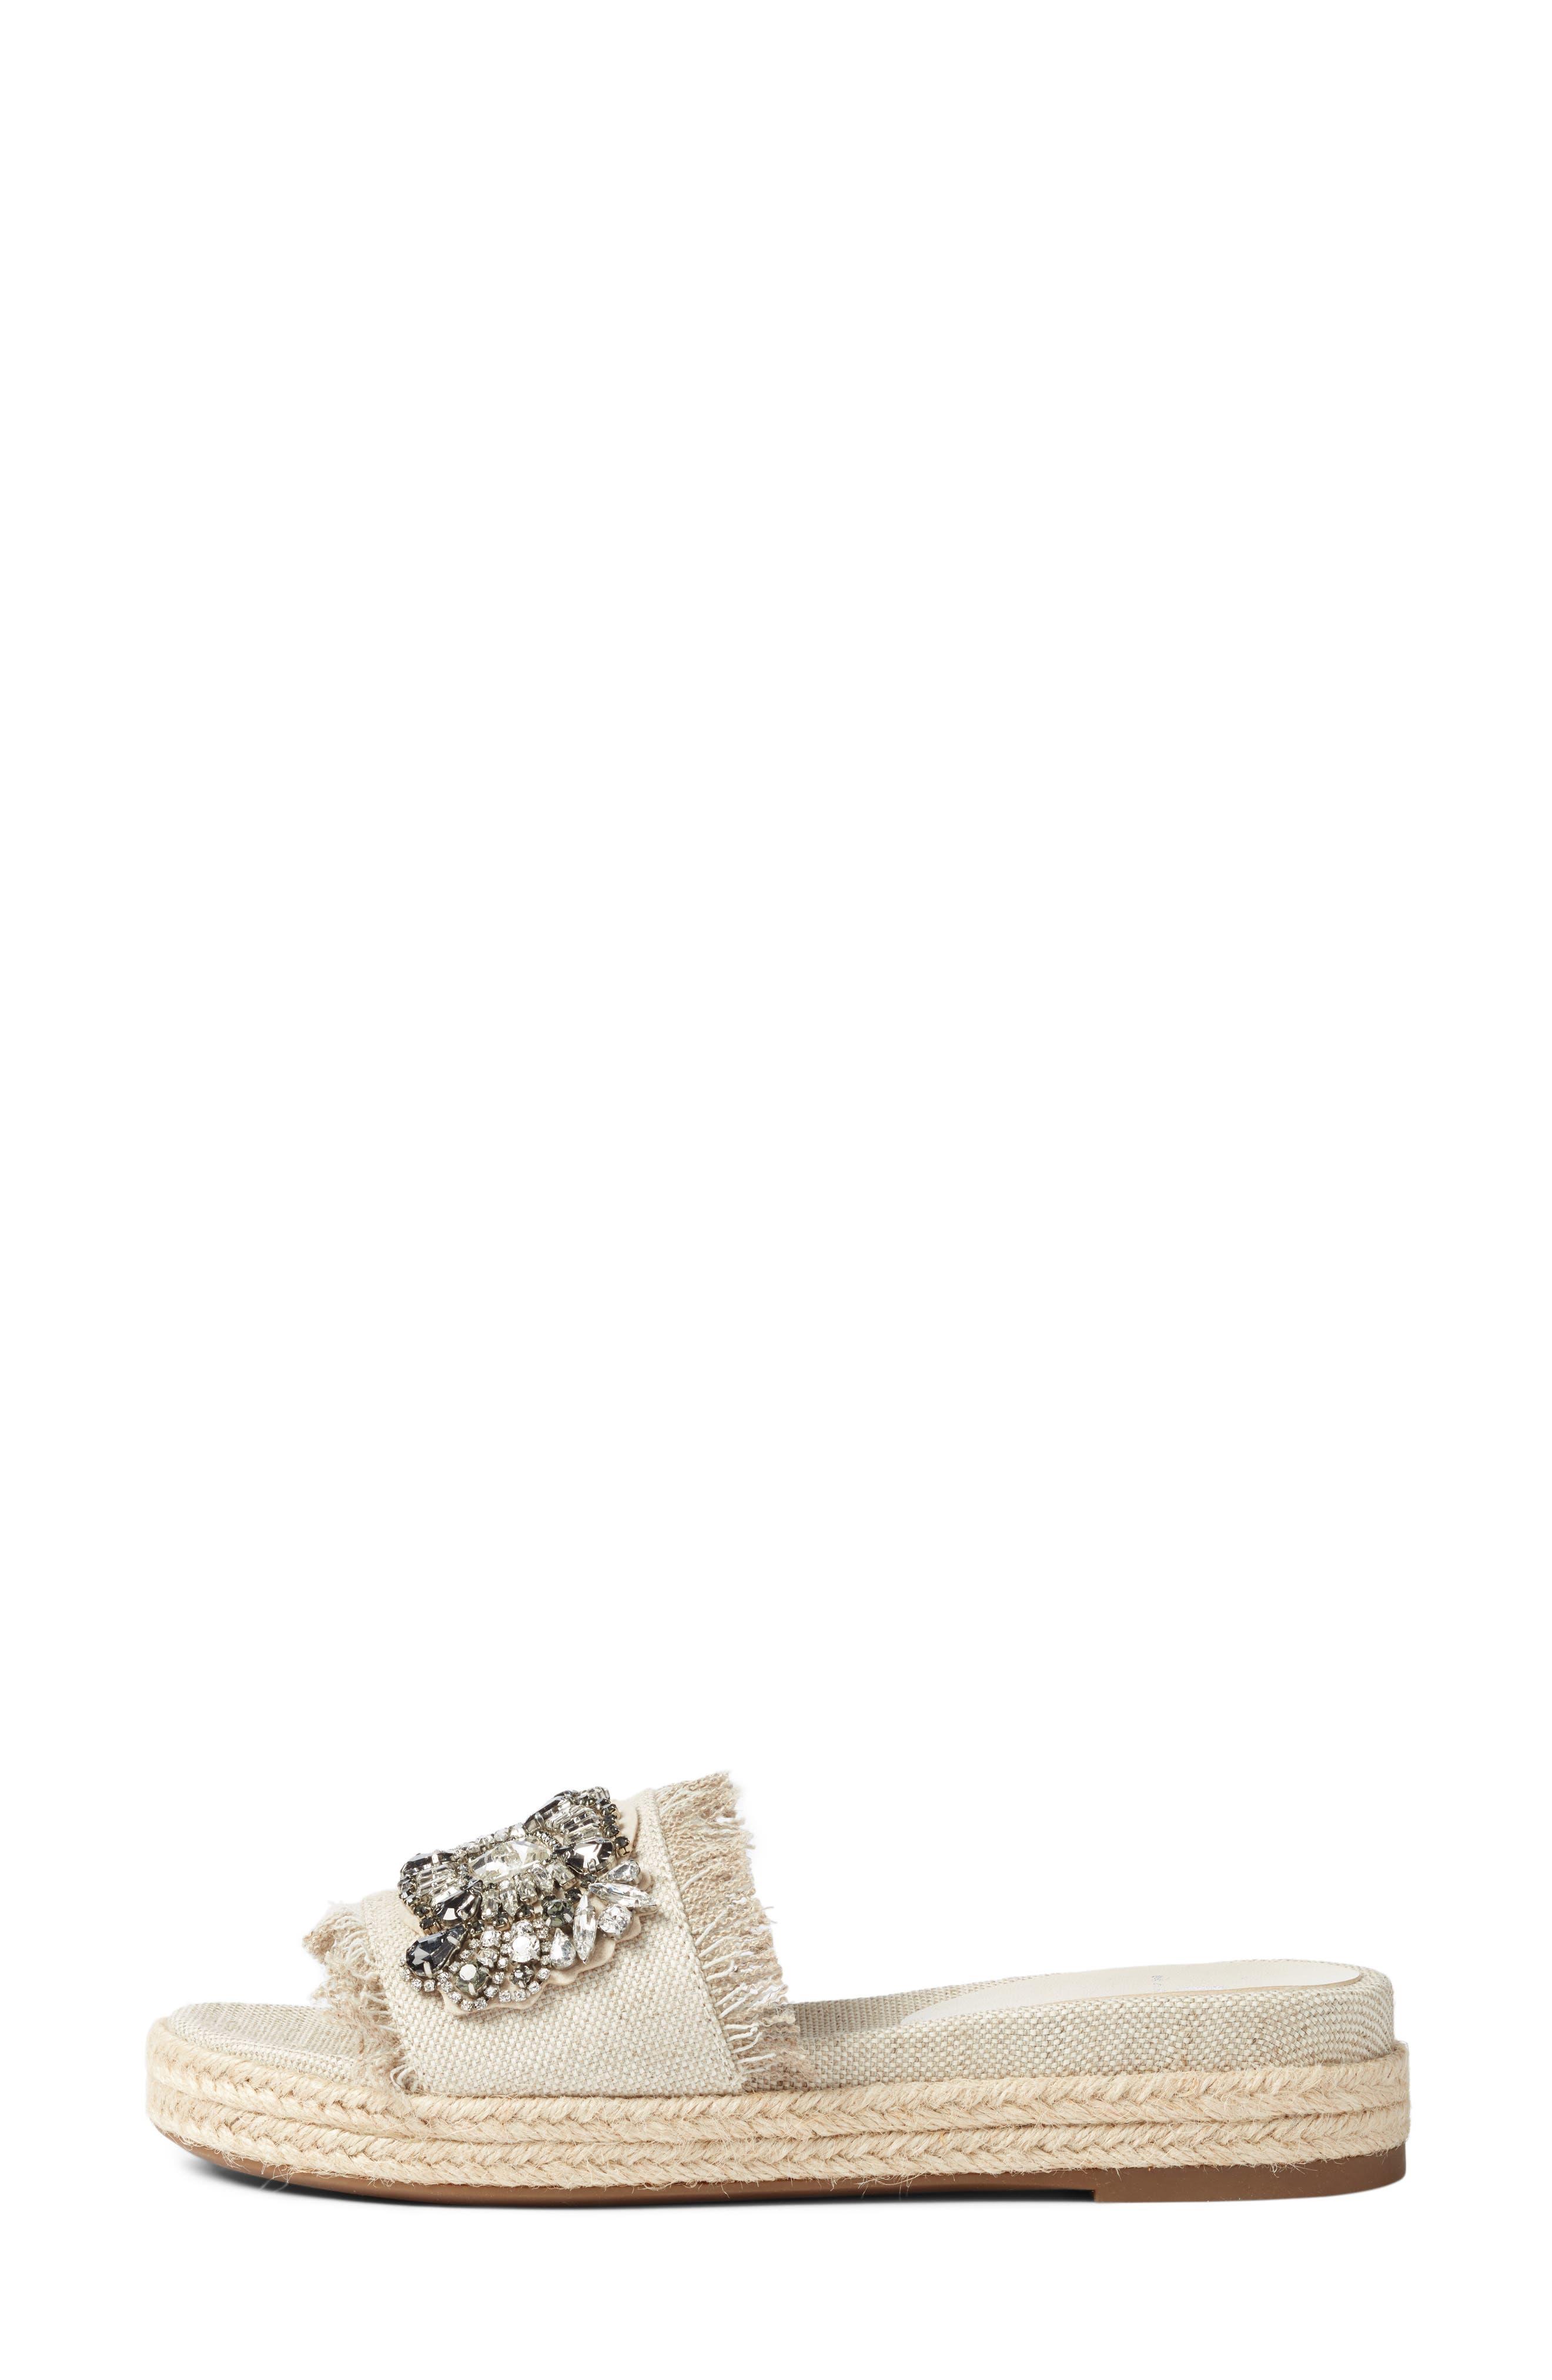 Jelly II Embellished Sandal,                             Alternate thumbnail 3, color,                             200